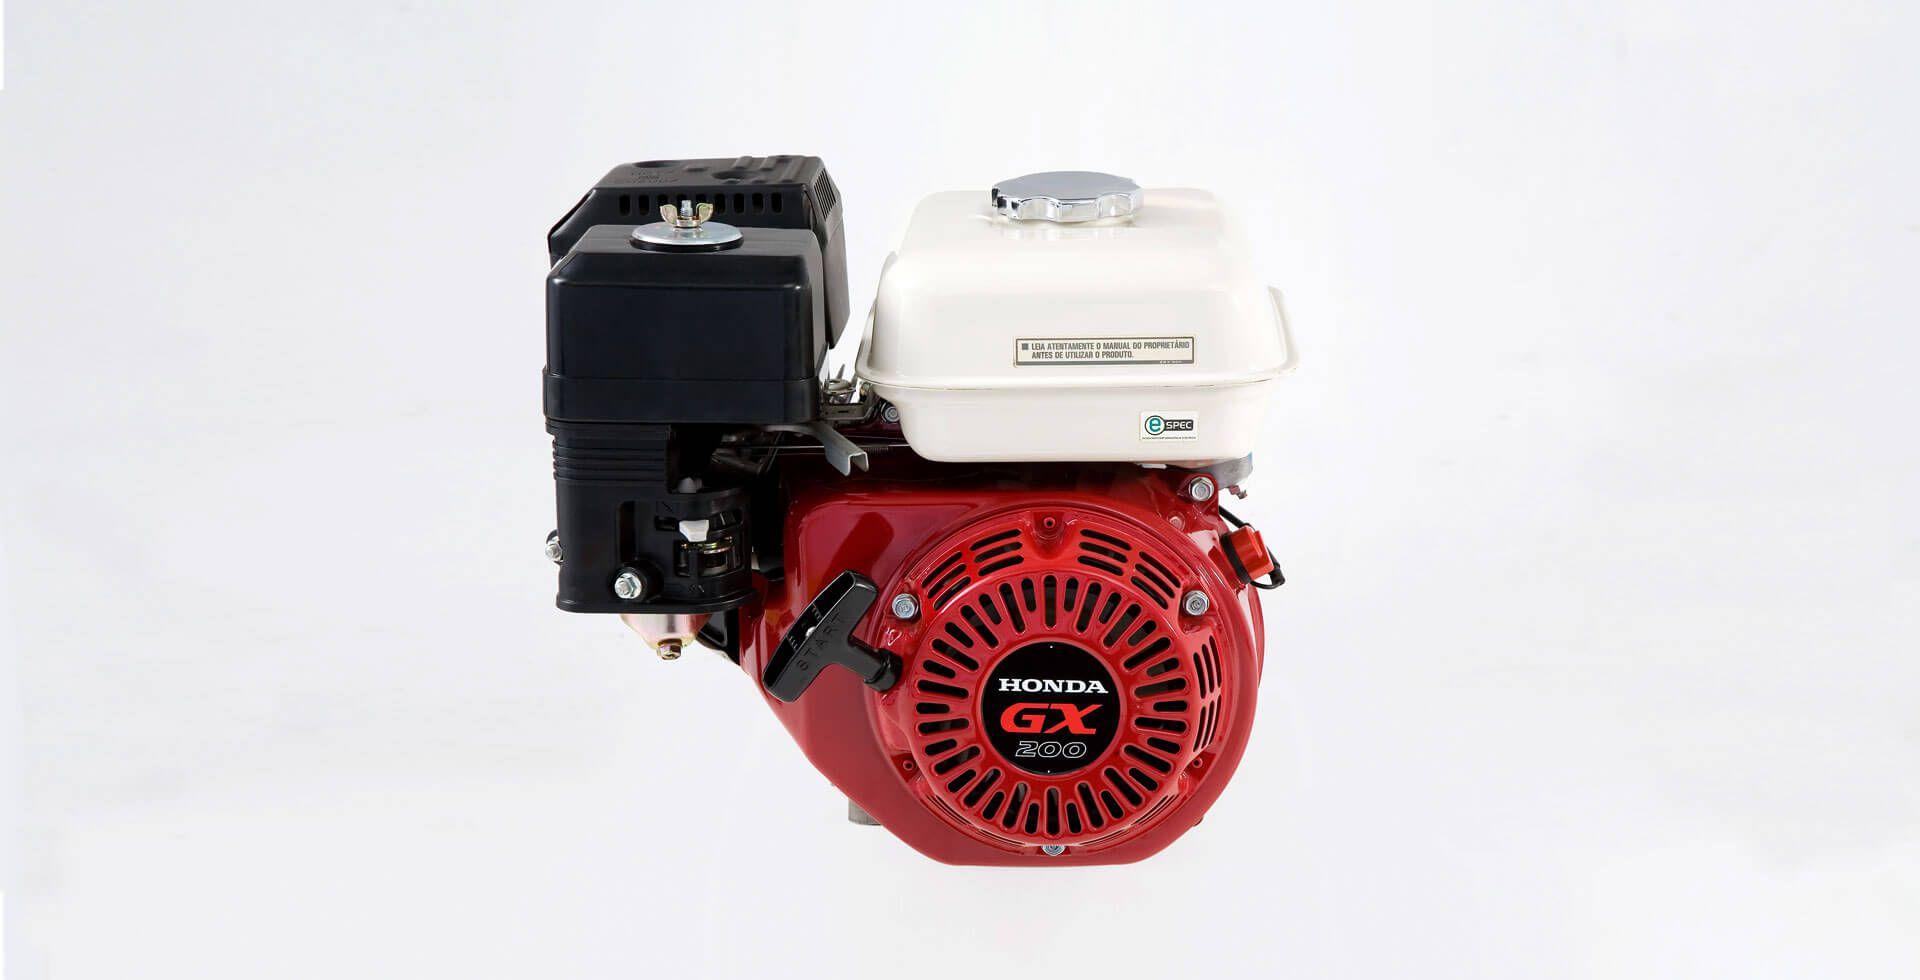 MOTOR 7,1 CV MOD. GX200MEGA  M/ HONDA